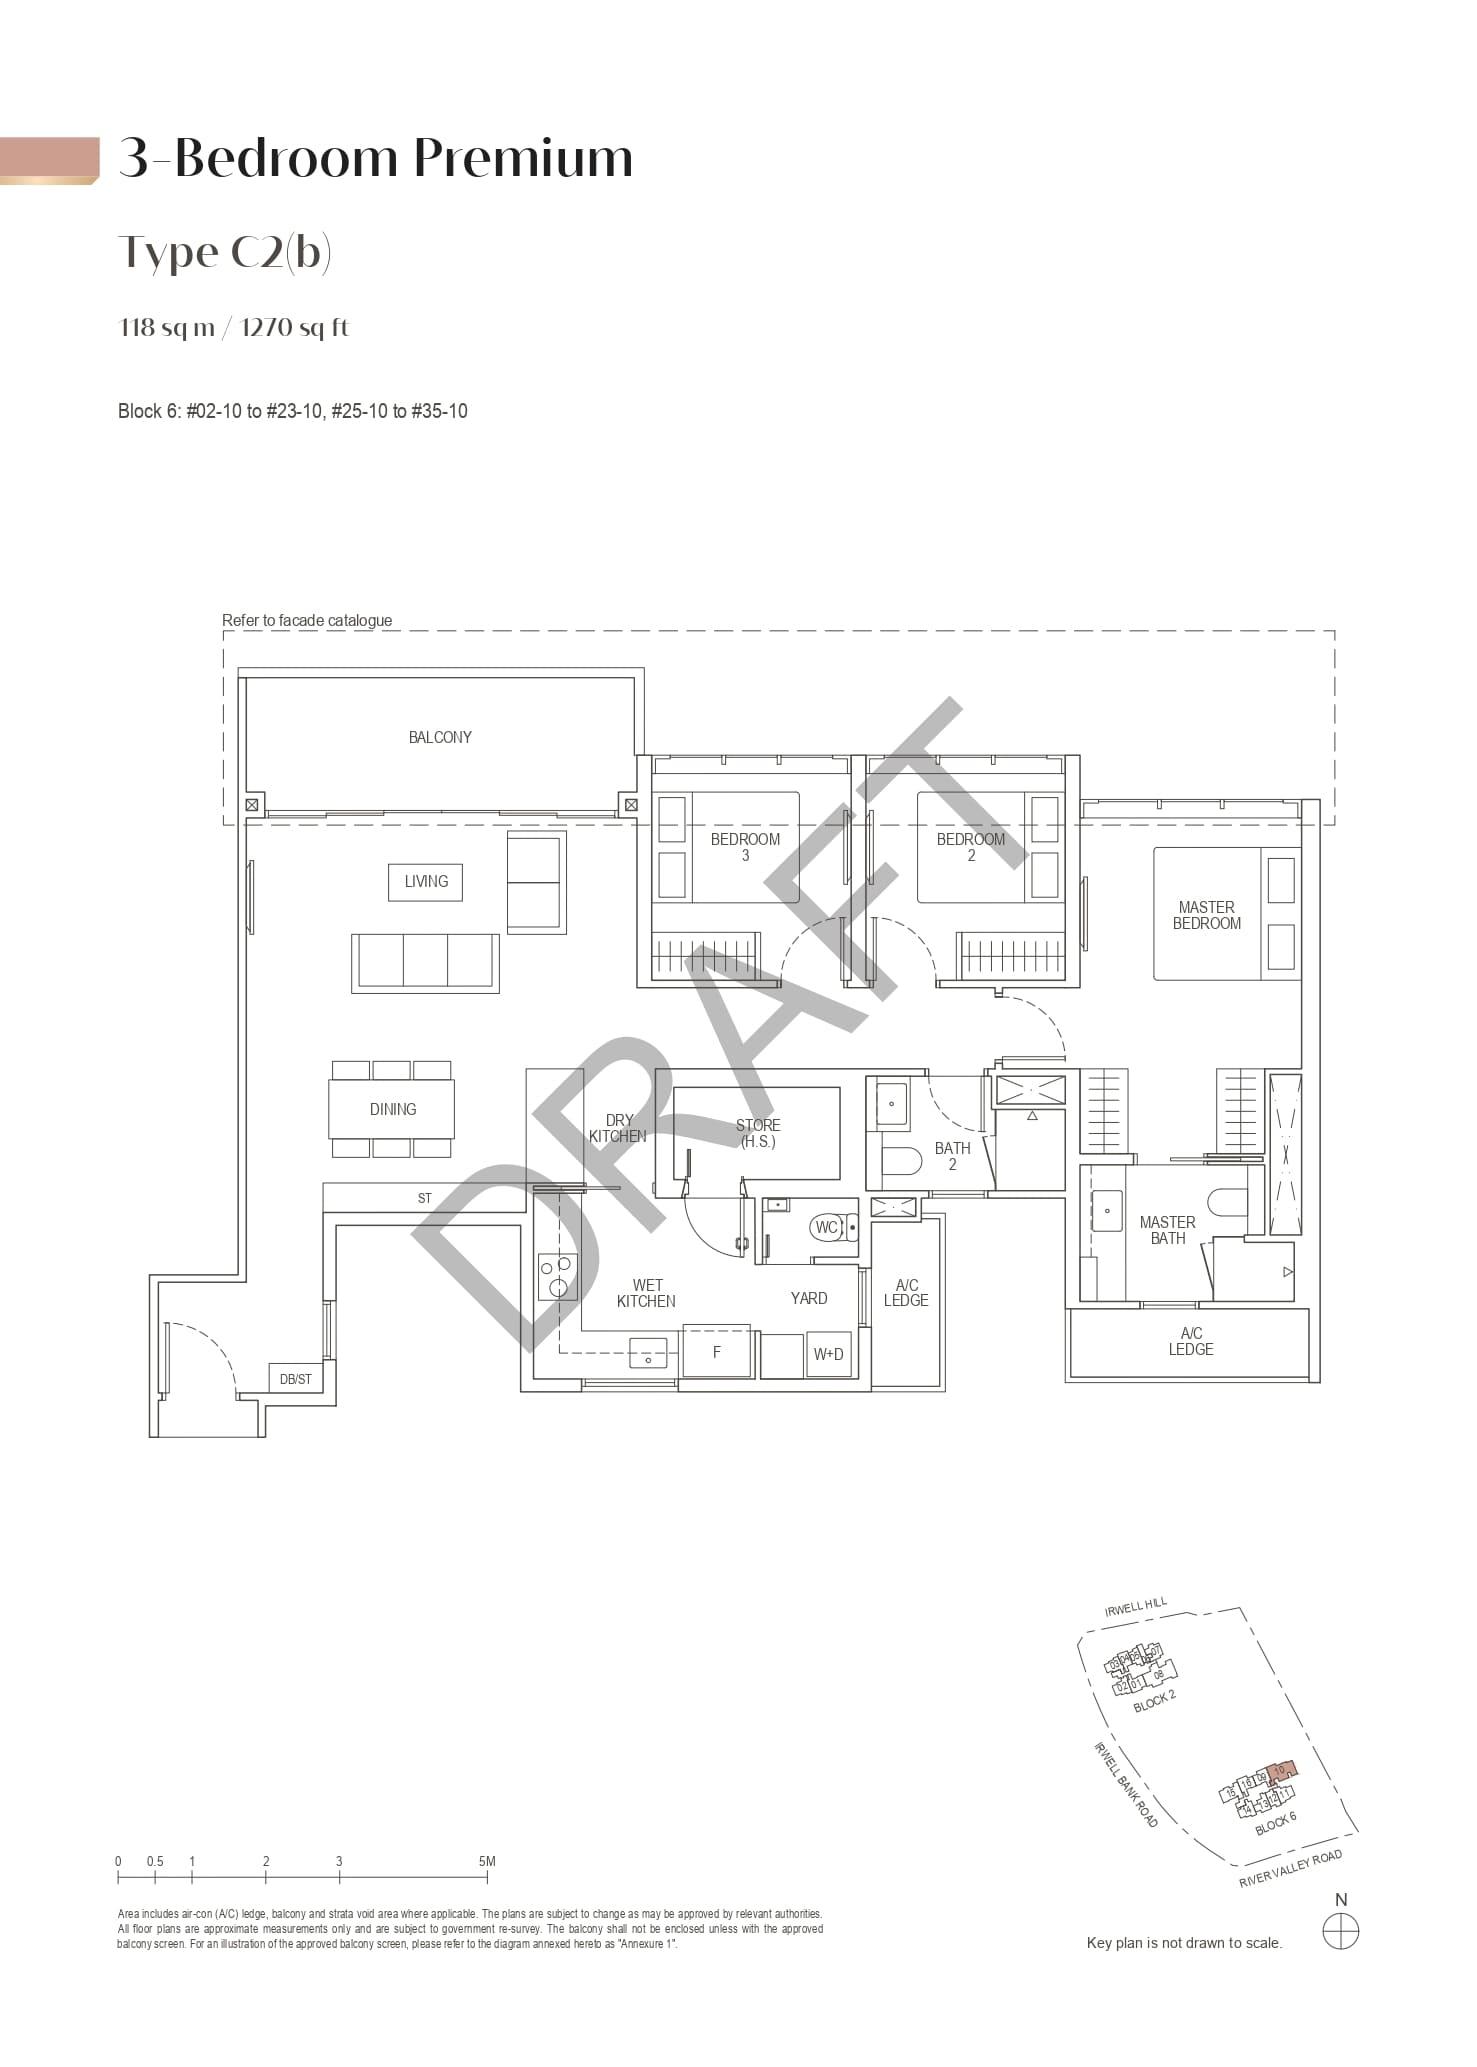 irwell-hill-residences-floor-plan-3-bedroom-premium-type-c2b